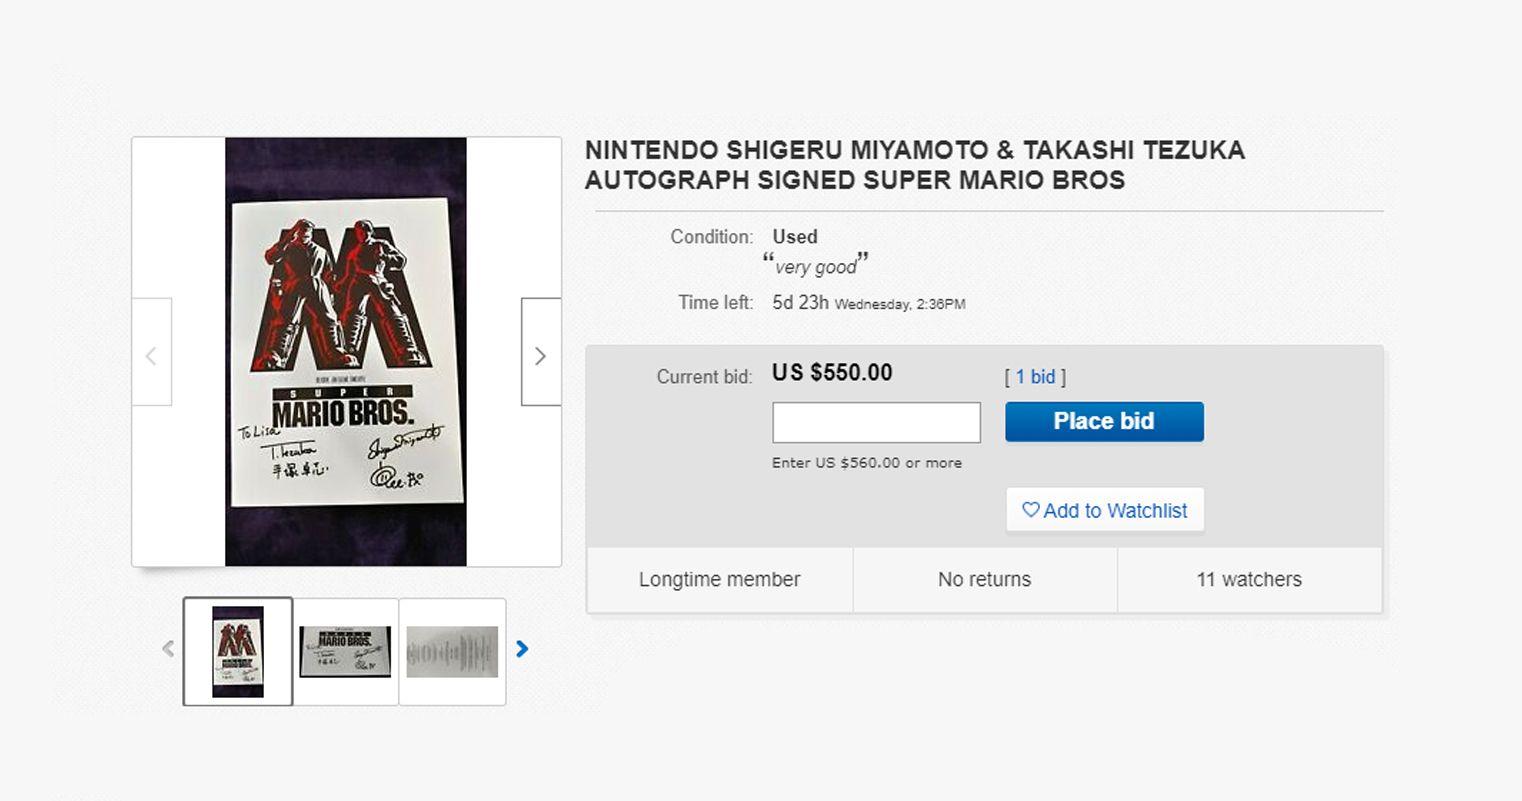 A Super Mario Bros Movie Poster With Shigeru Miyamoto S Signature